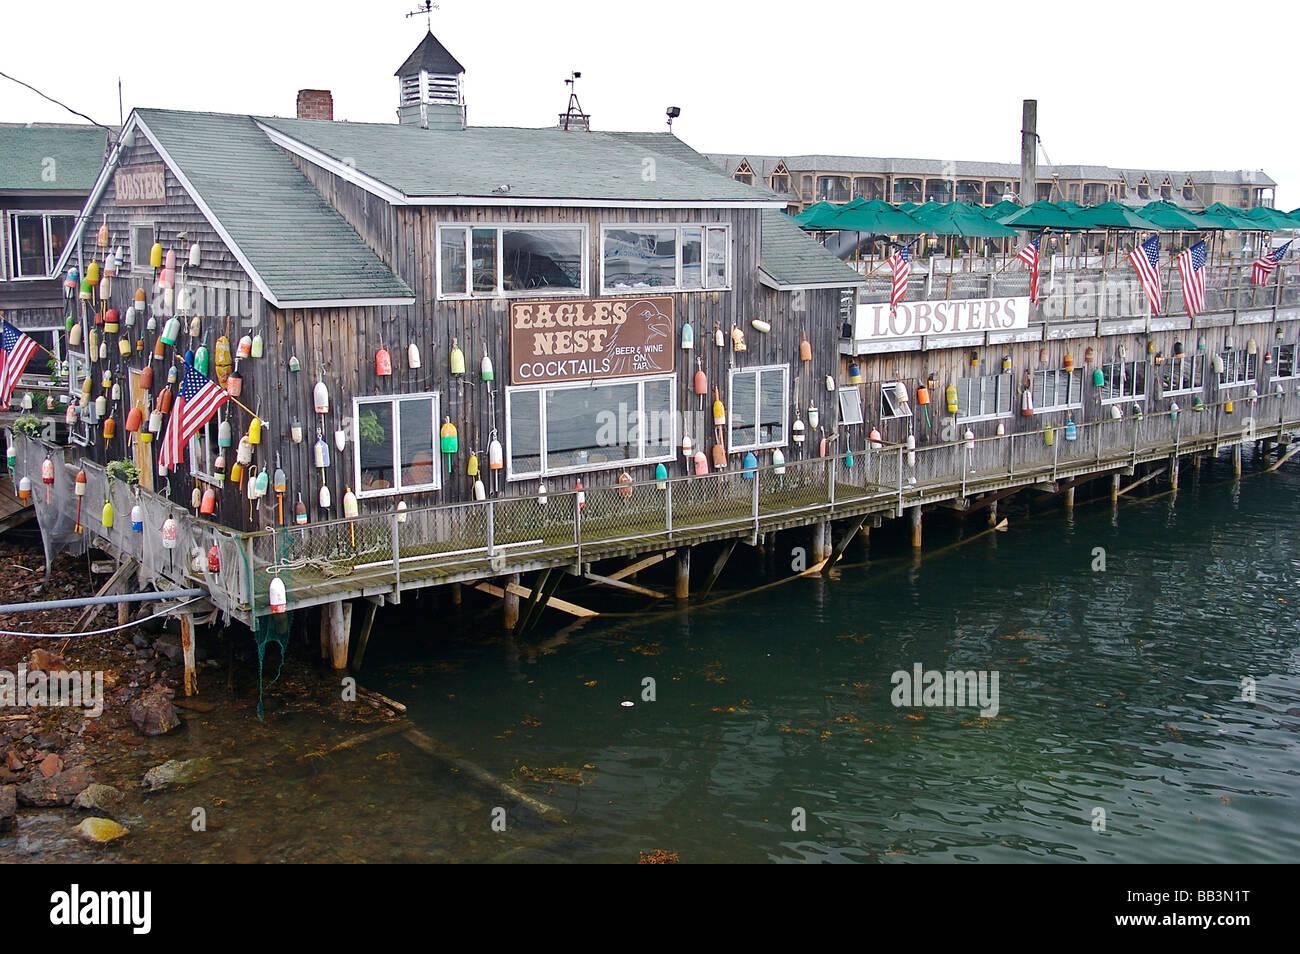 North America Usa Maine Bar Harbor A Seafood Restaurant On The